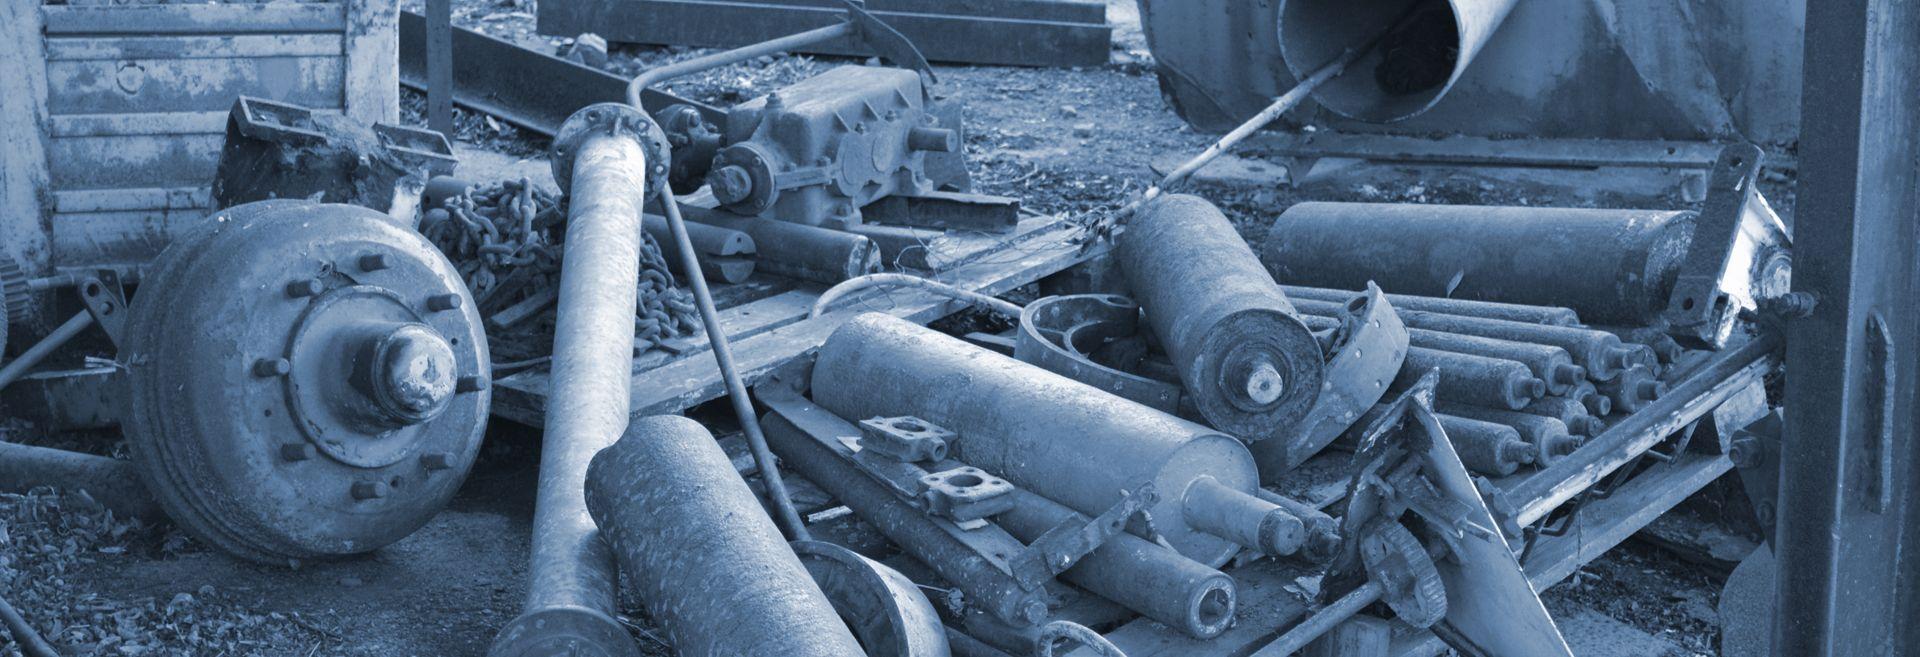 Tempe Junk Removal - Providing Appliance removal in Tempe and Bulk ...